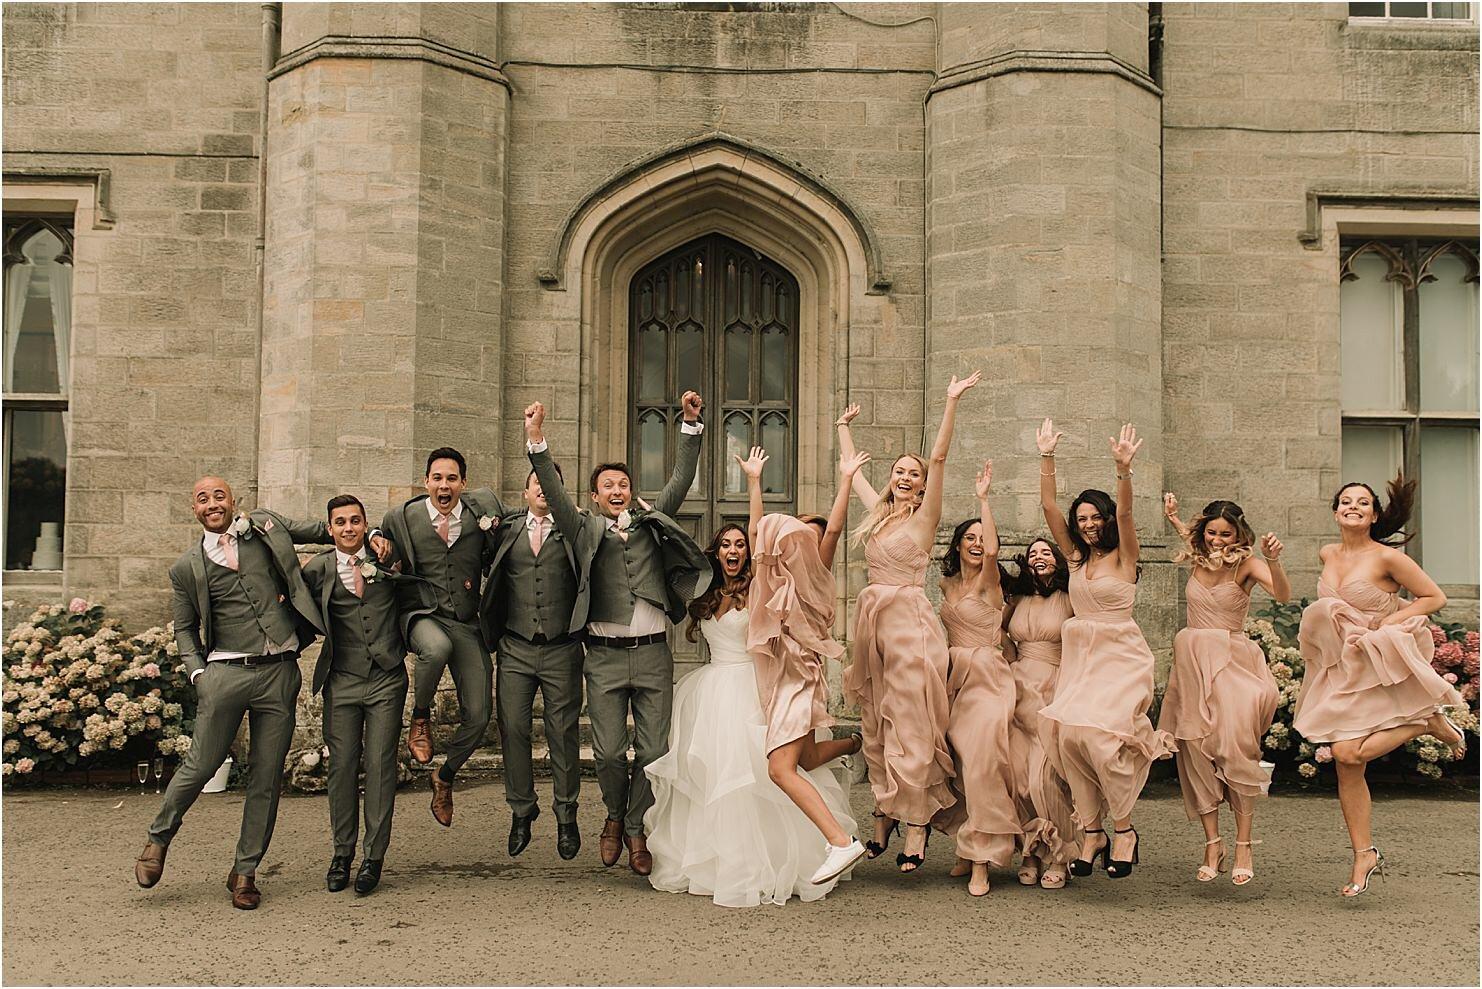 boda-de-cuento-en-castillo-boda-en-londres-75.jpg